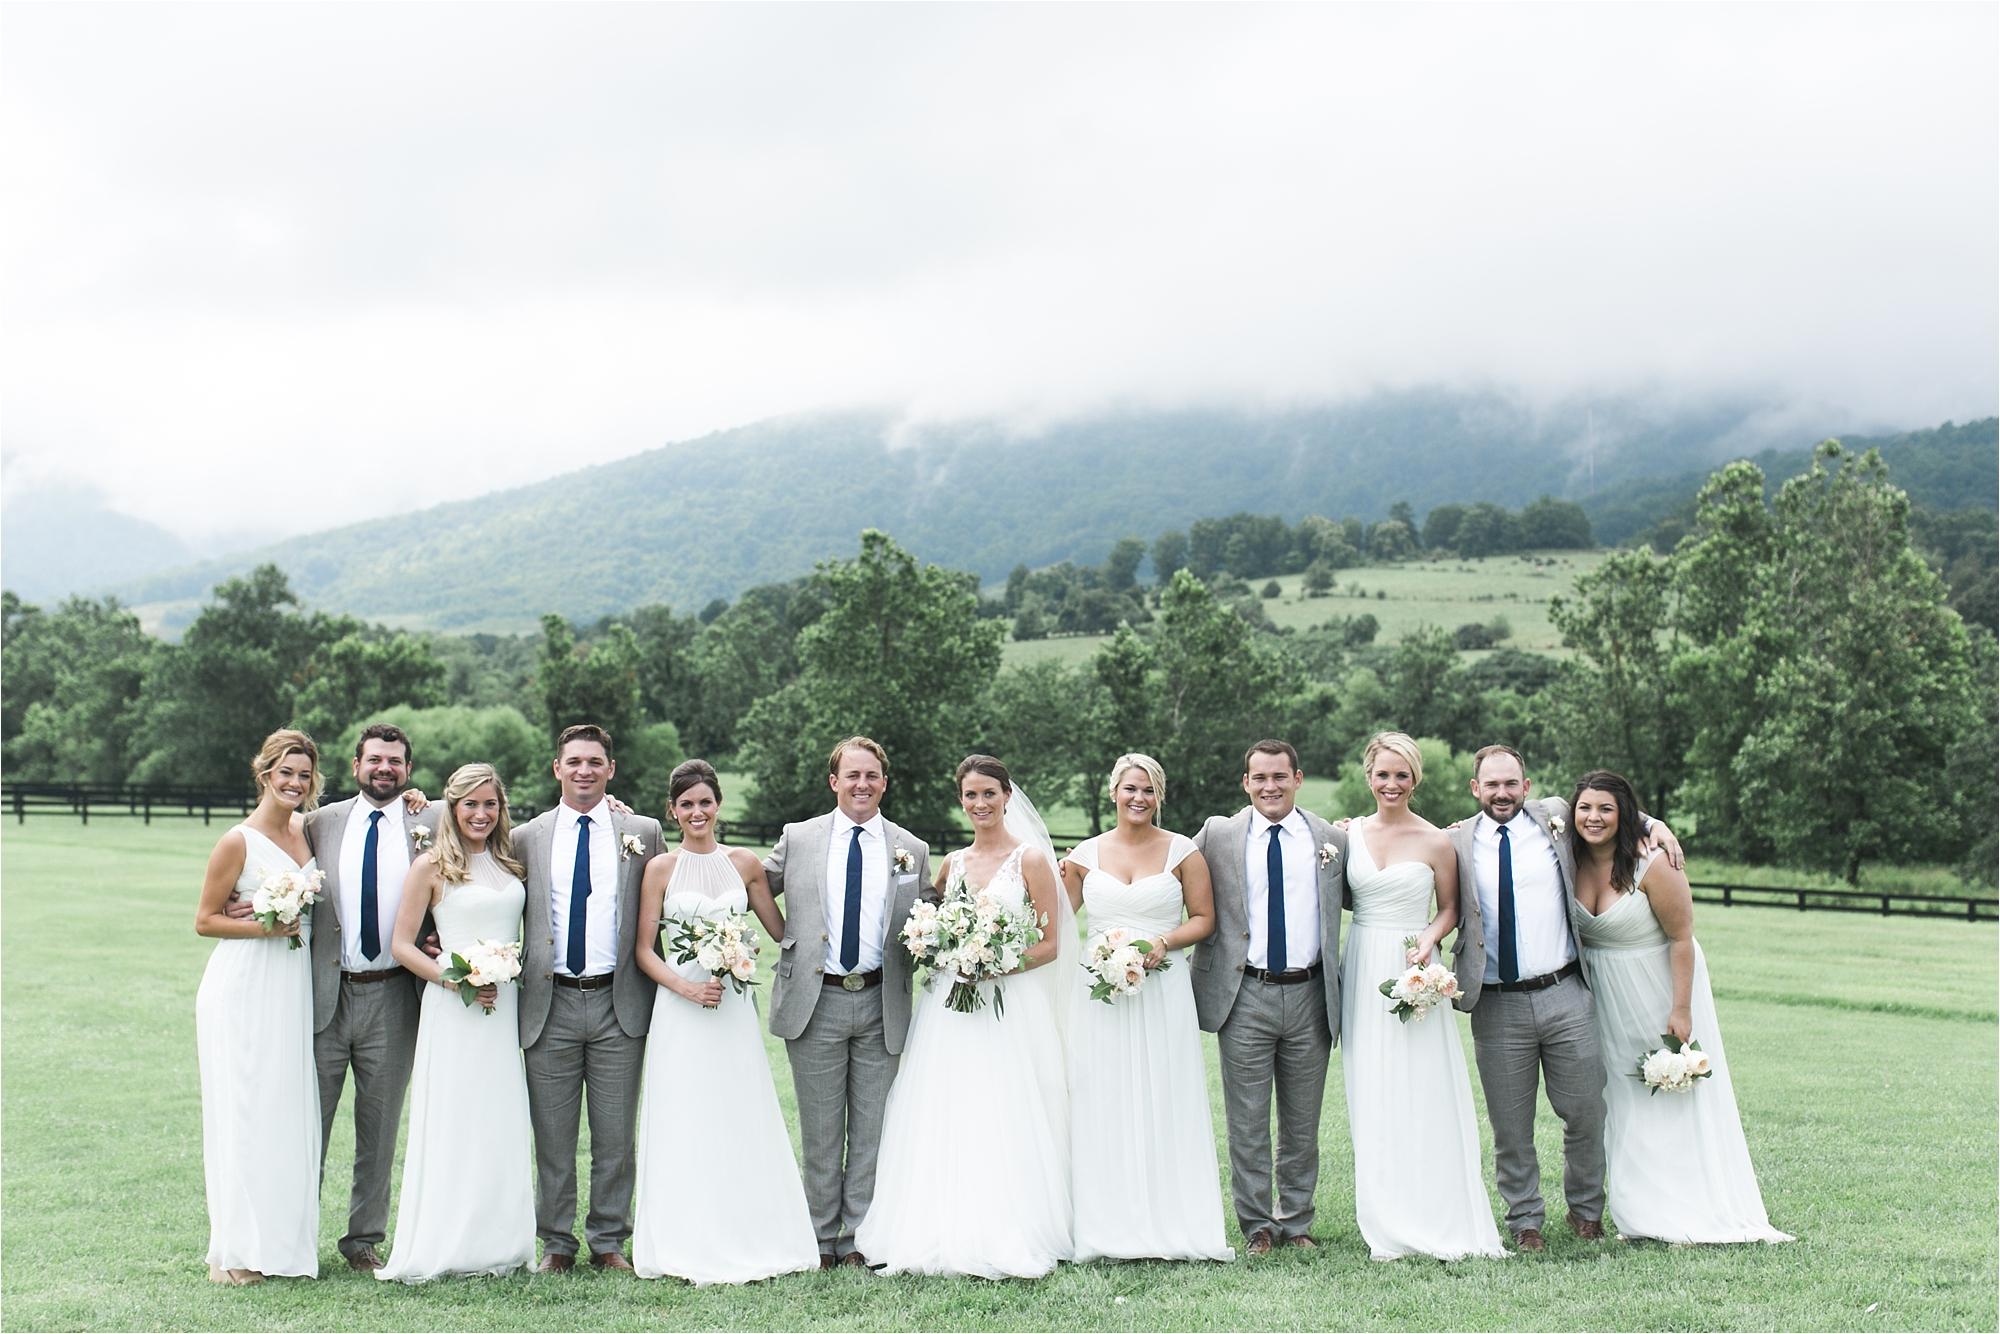 stephanie-yonce-charlottesville-virginia-king-family-vineyard-wedding-photos_0023.jpg